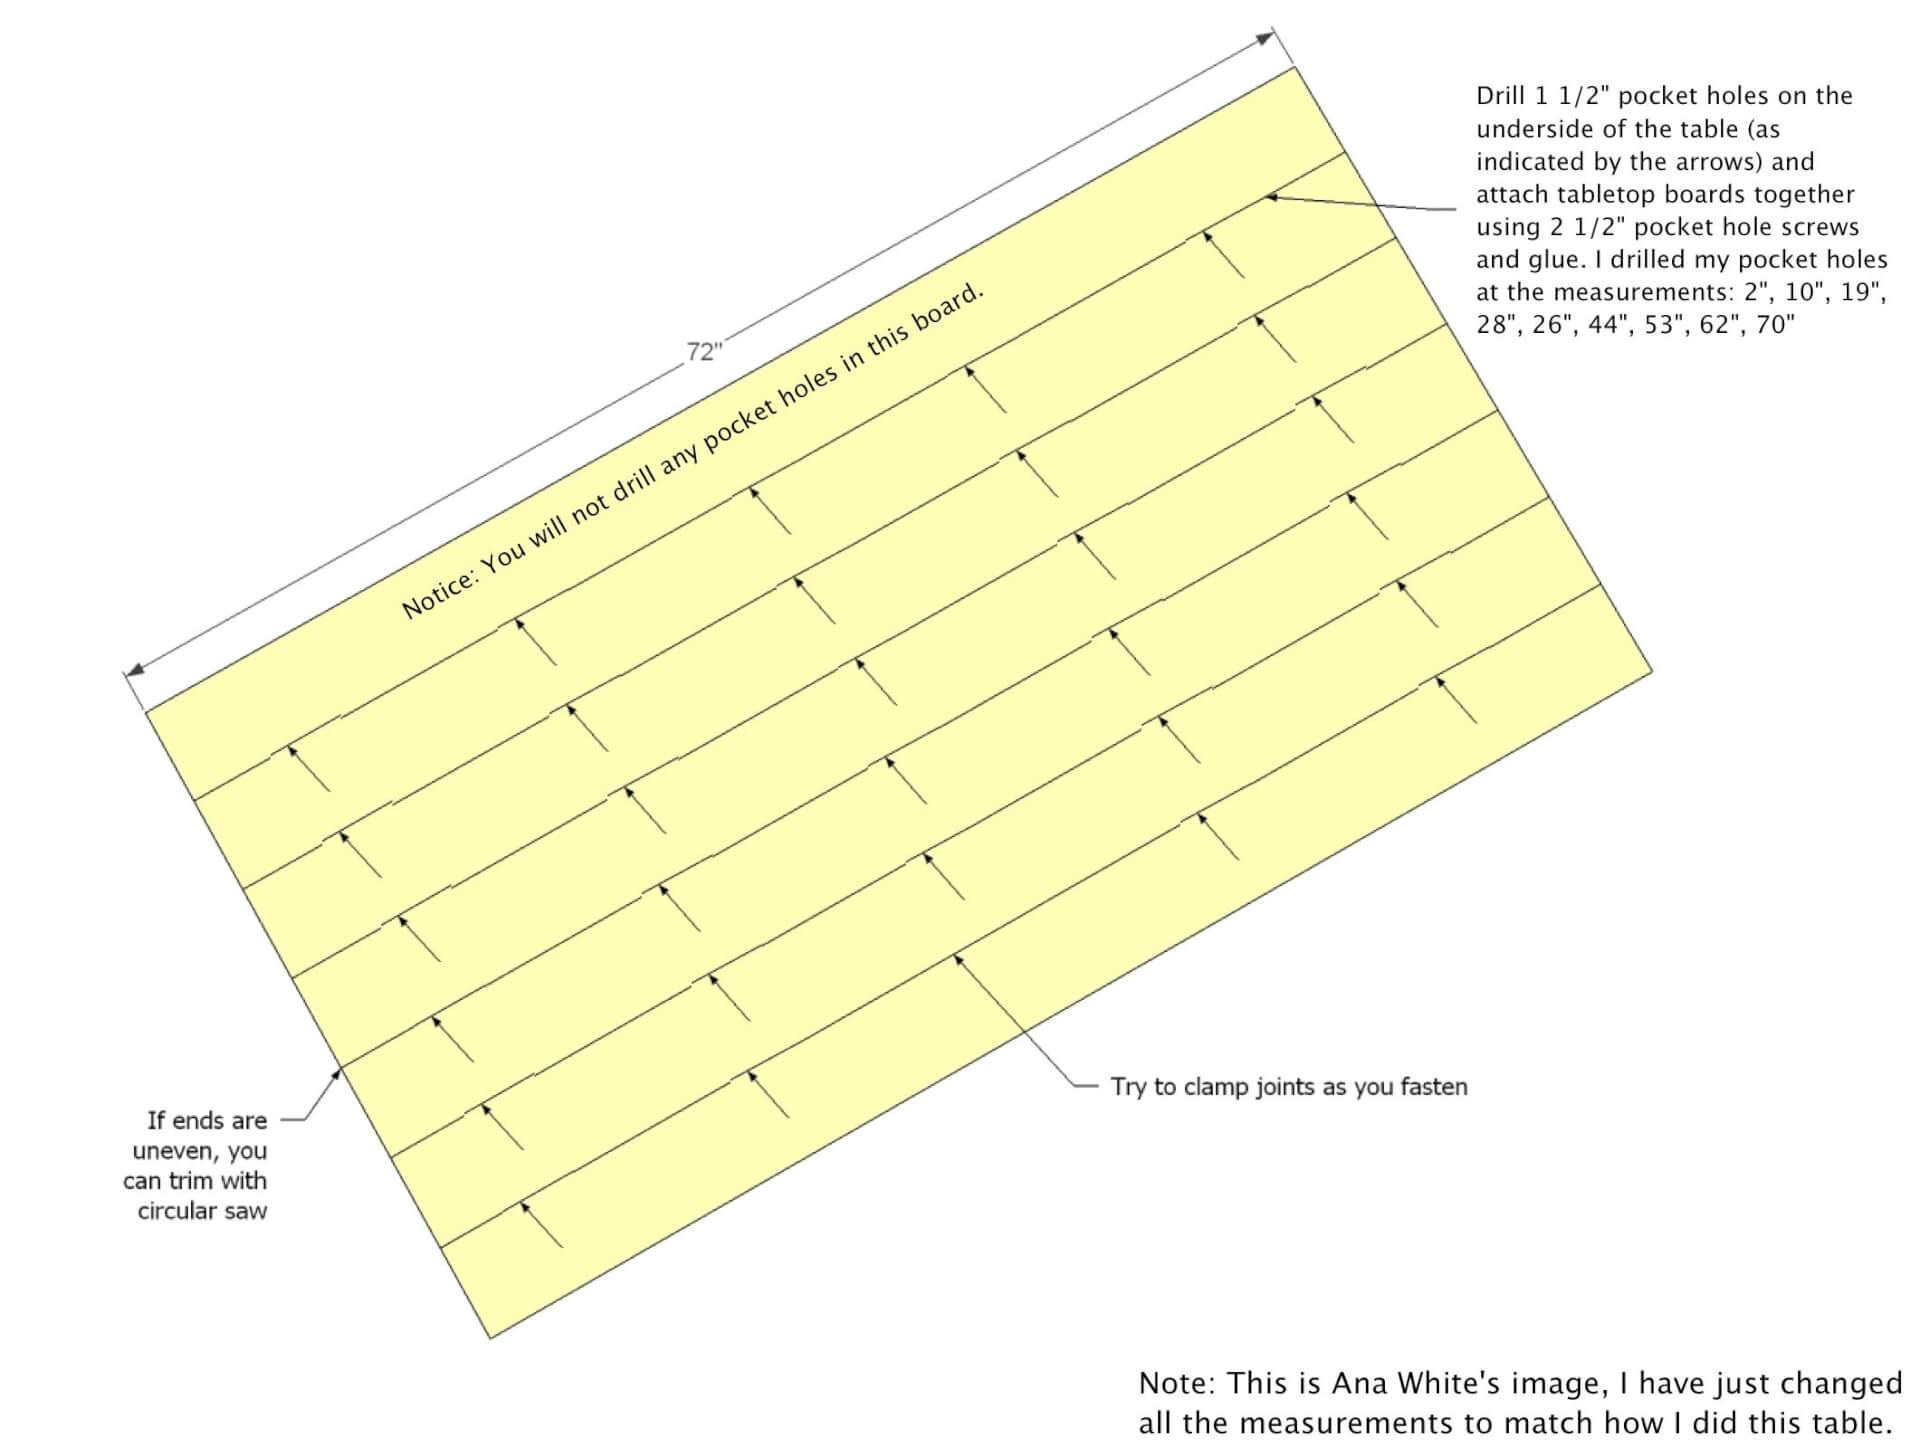 ... Boards) And Attach Tabletop Boards Together Using 2 1/2u2033 Pocket Hole  Screws And Glue. I Drilled My Pocket Holes At The Measurements: 2u2033, 10u2033,  19u2033, 28u2033, ...